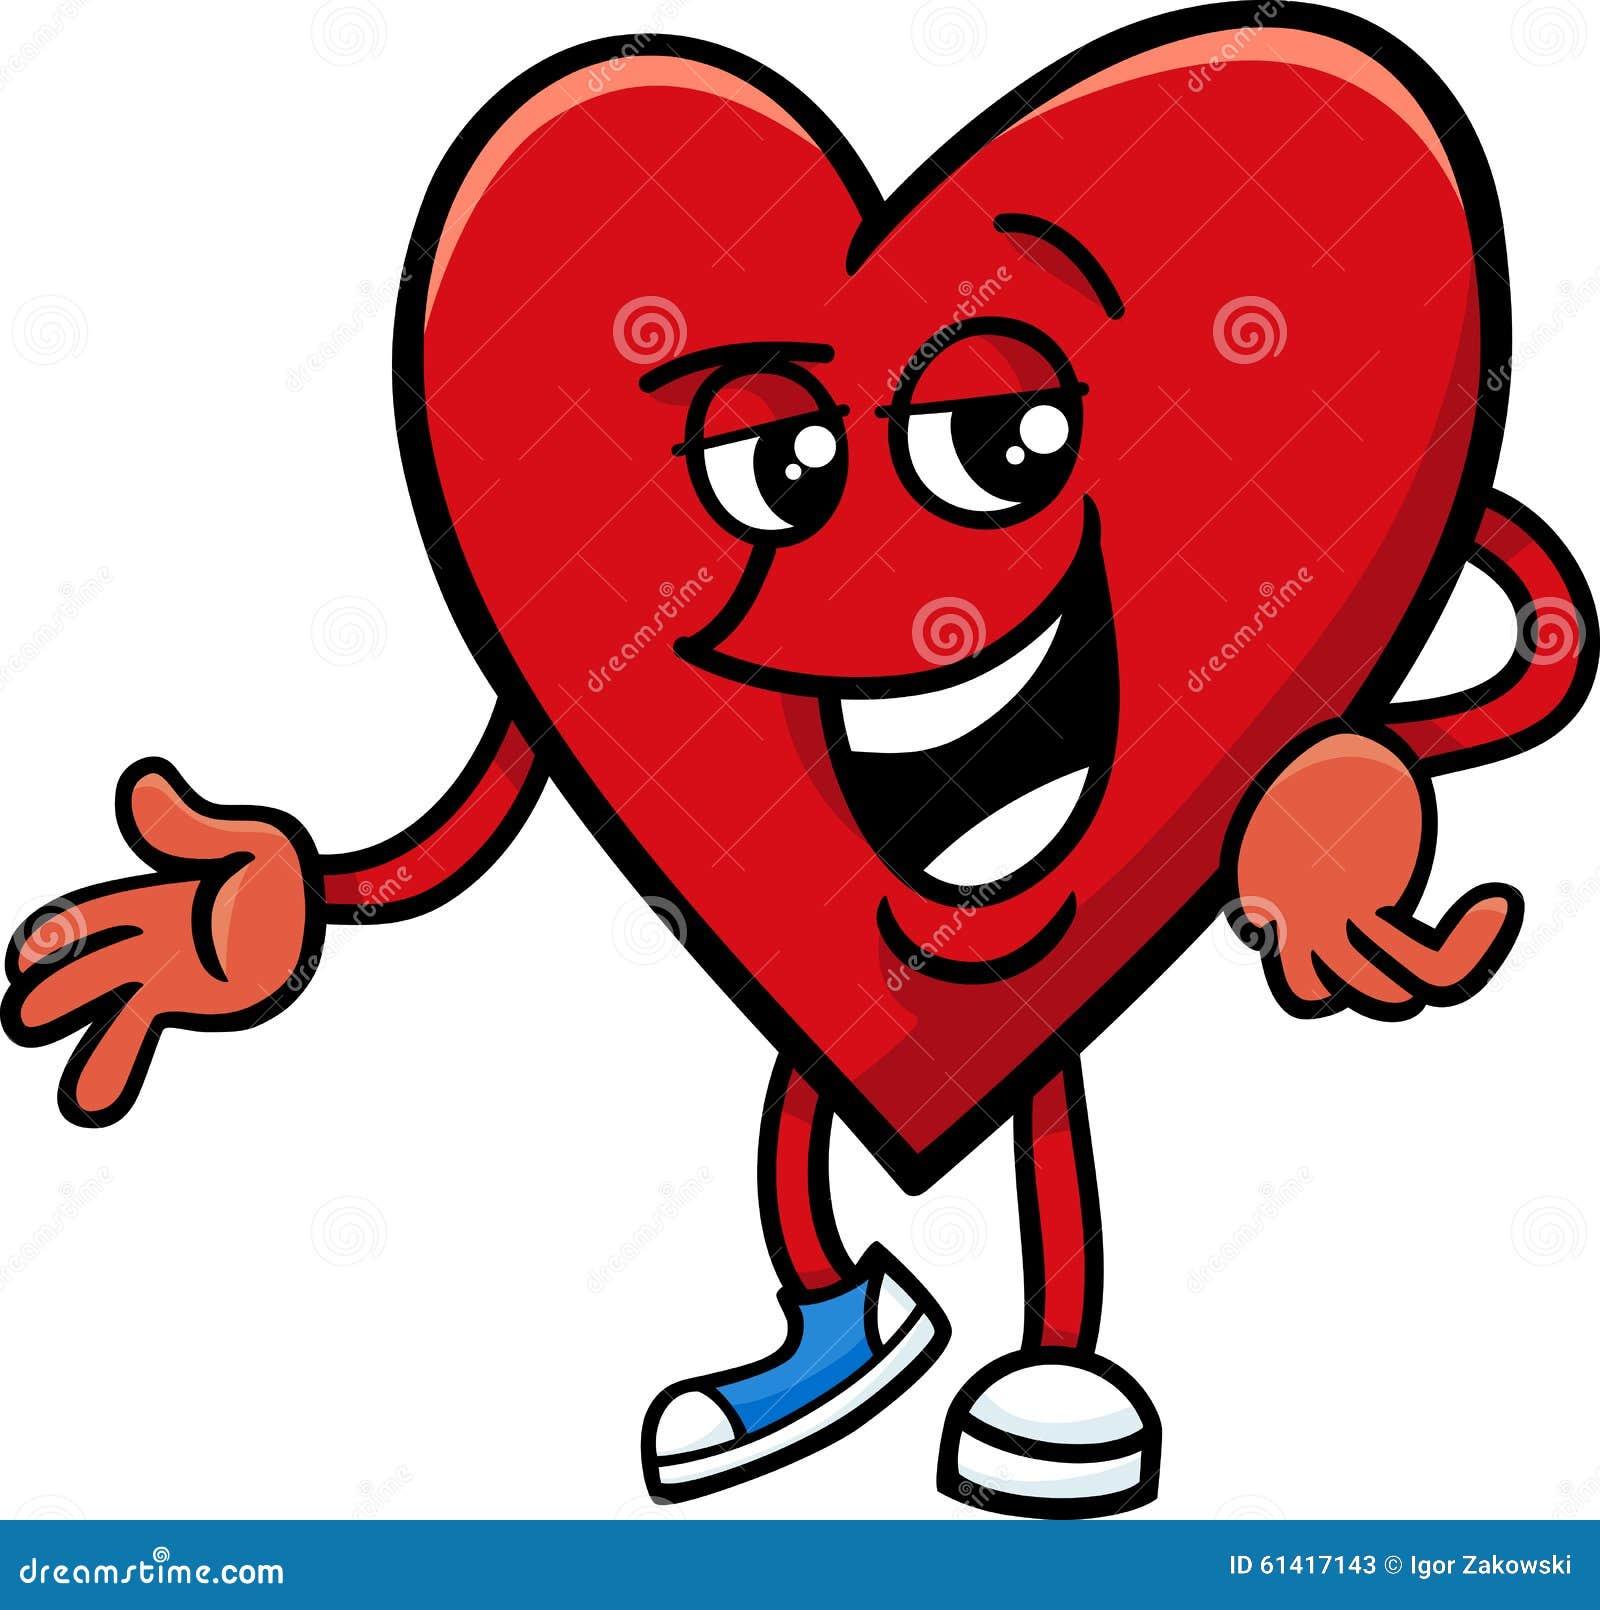 Cartoon Characters Valentines Day : Heart valentine cartoon character stock vector